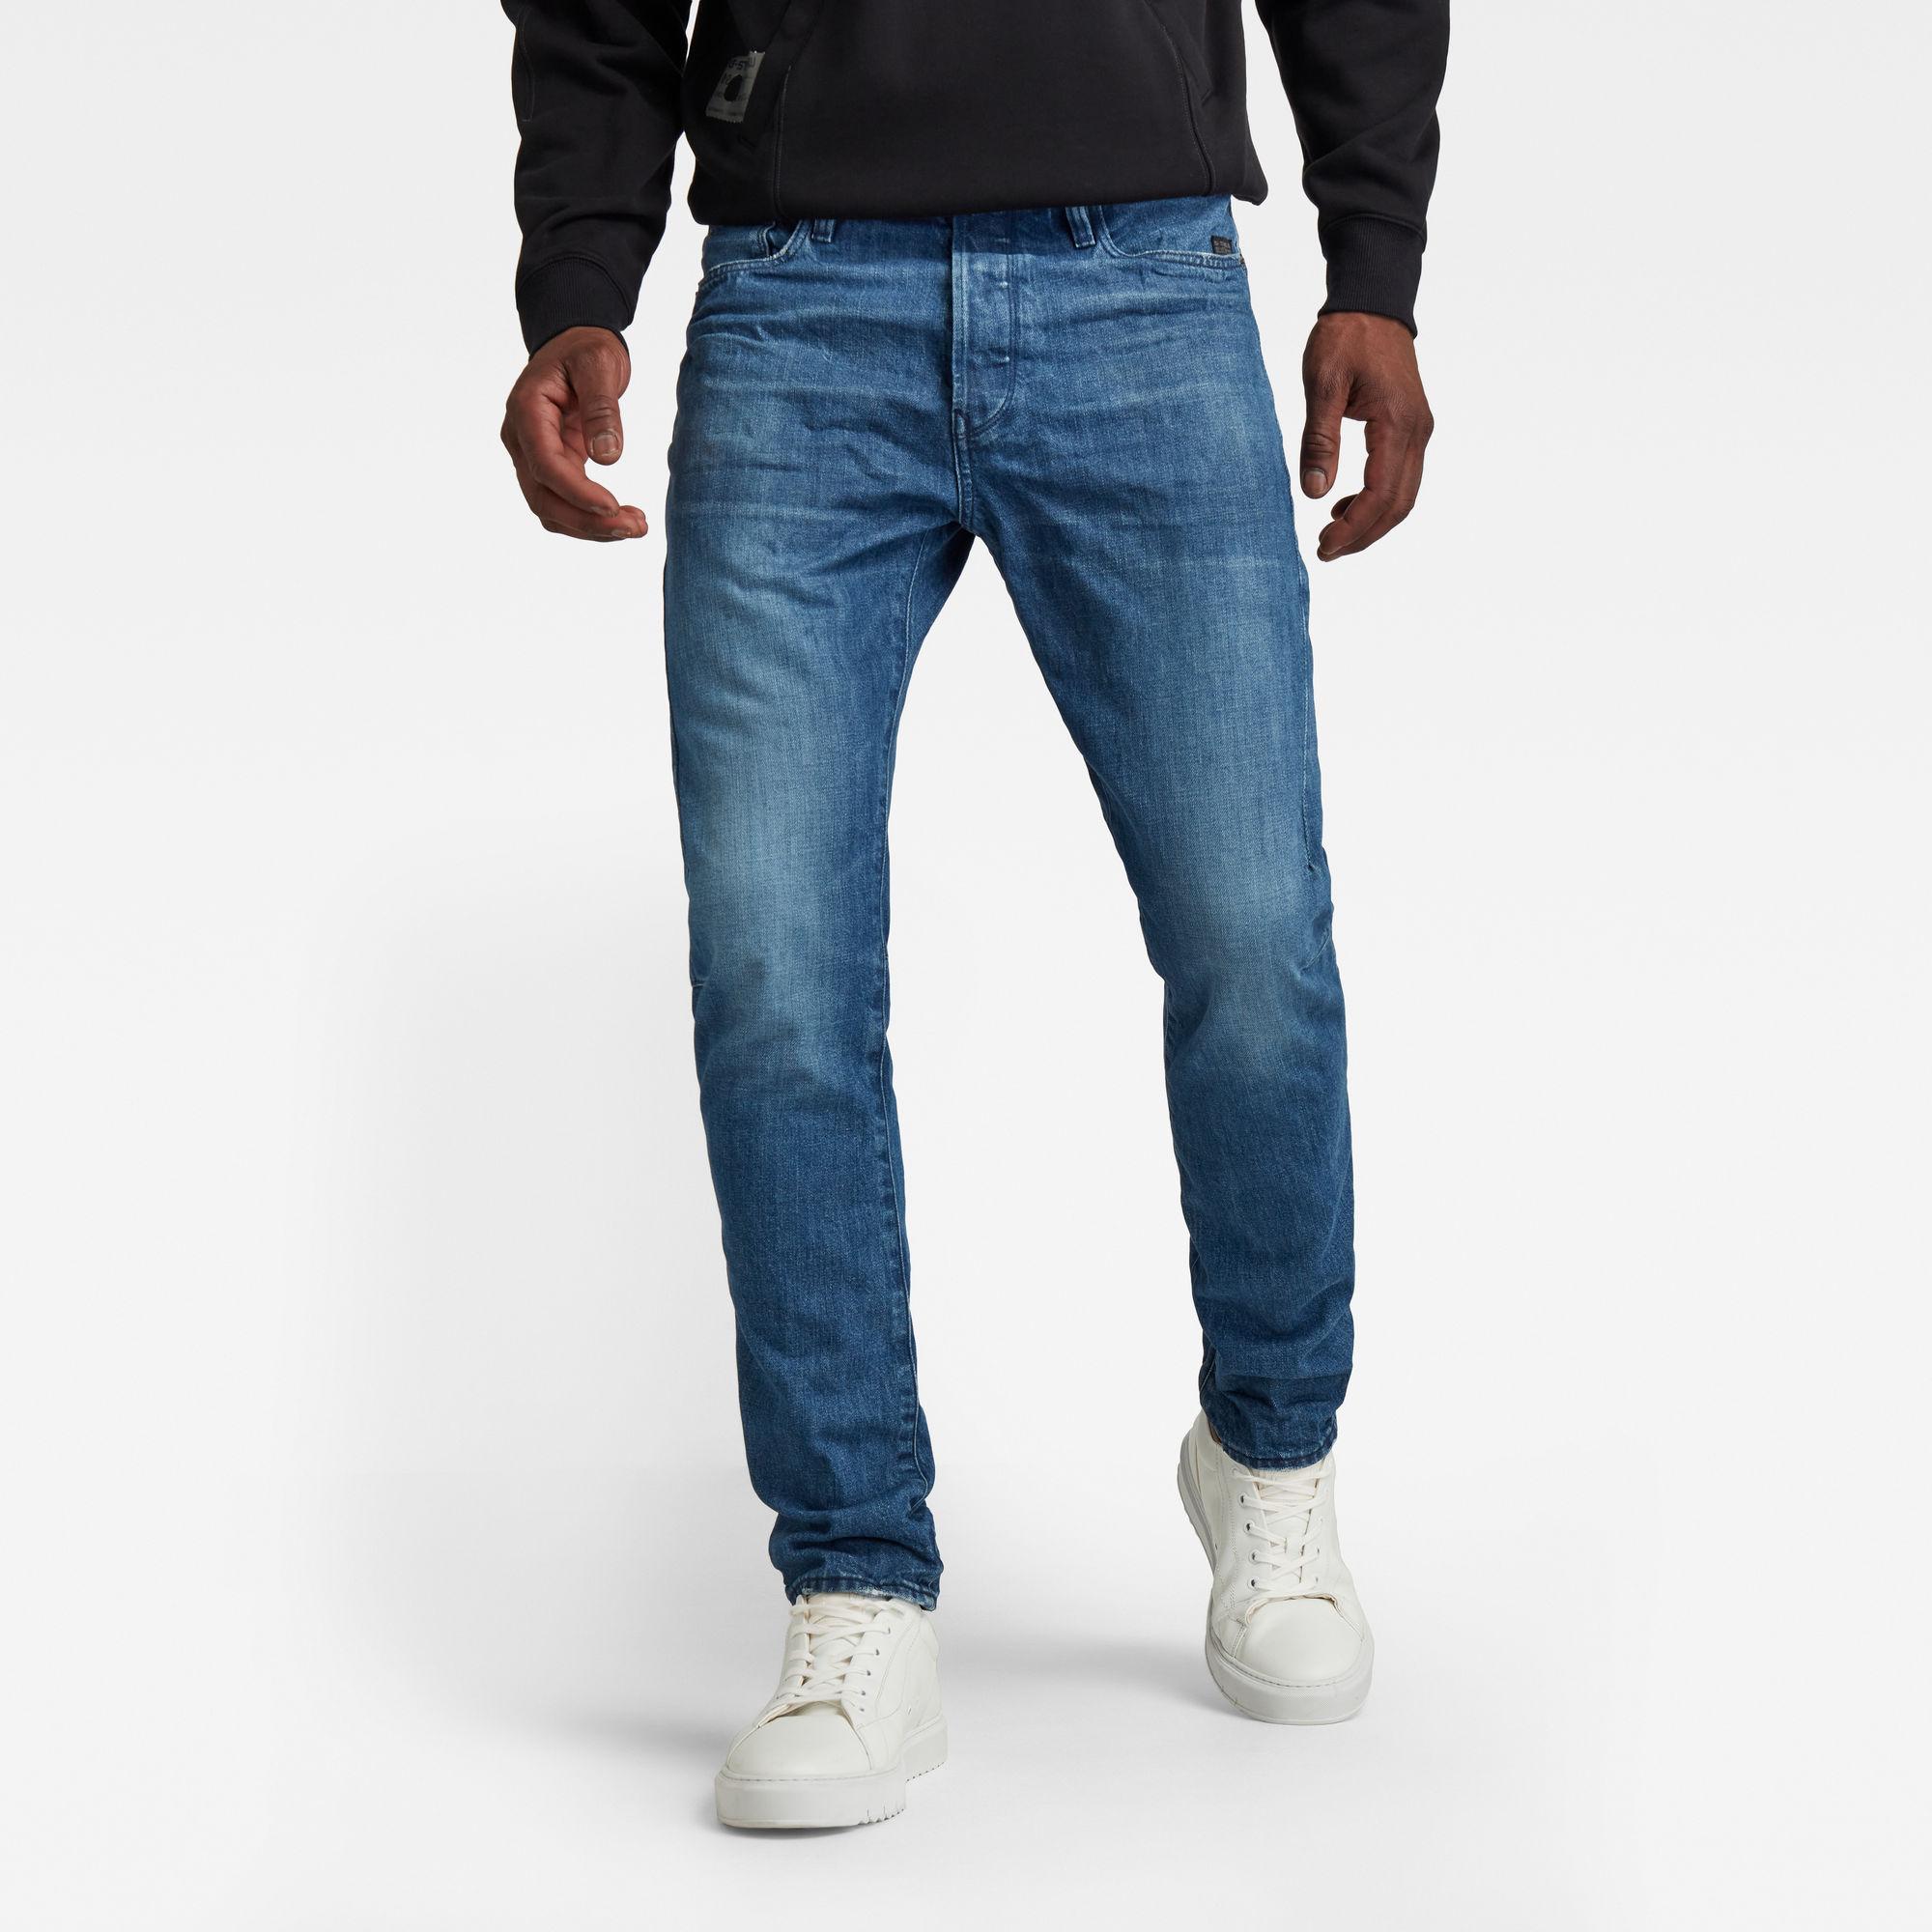 G-Star RAW Heren Scutar 3D Slim Jeans Blauw